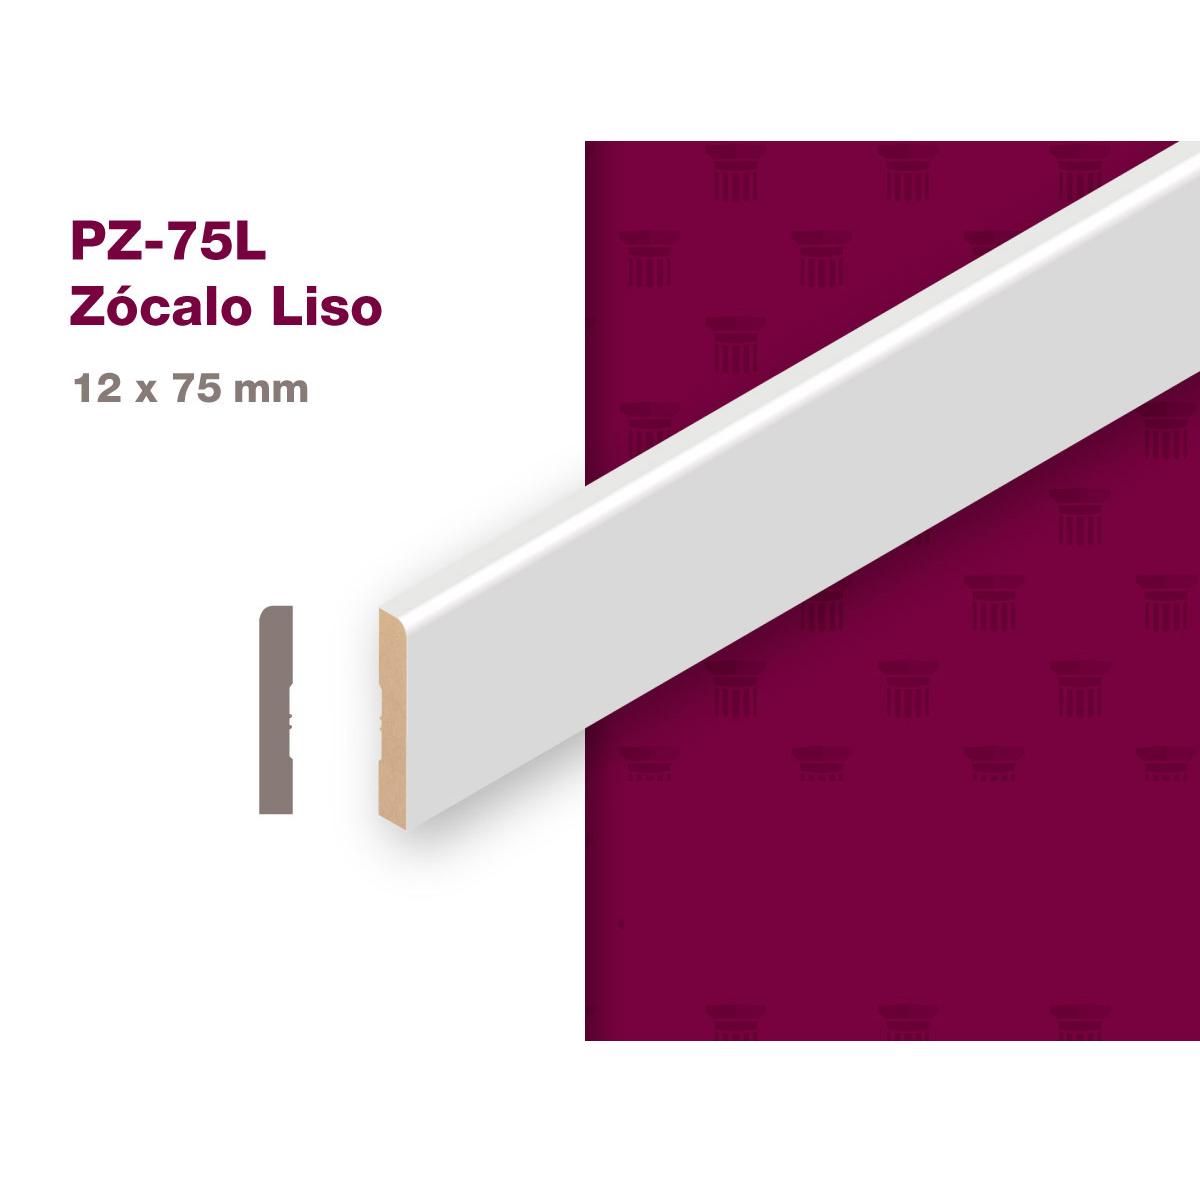 ZOCALO MDF PREPINTADO/12X75x2.75 PZ-75L